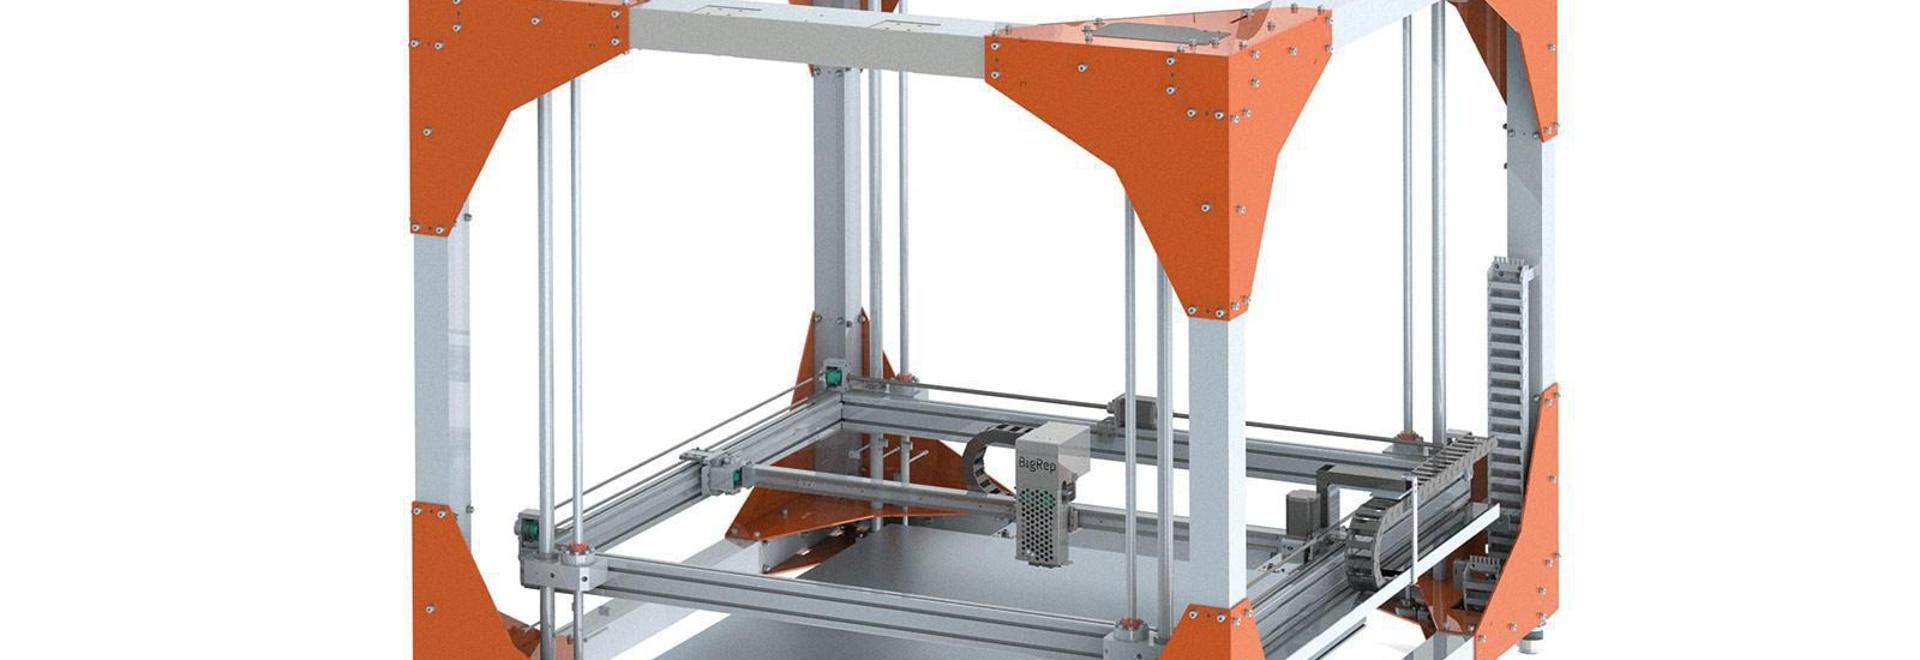 BigRep et Bosch Rexroth Partnering jusqu'à l'impression du cartel 3D